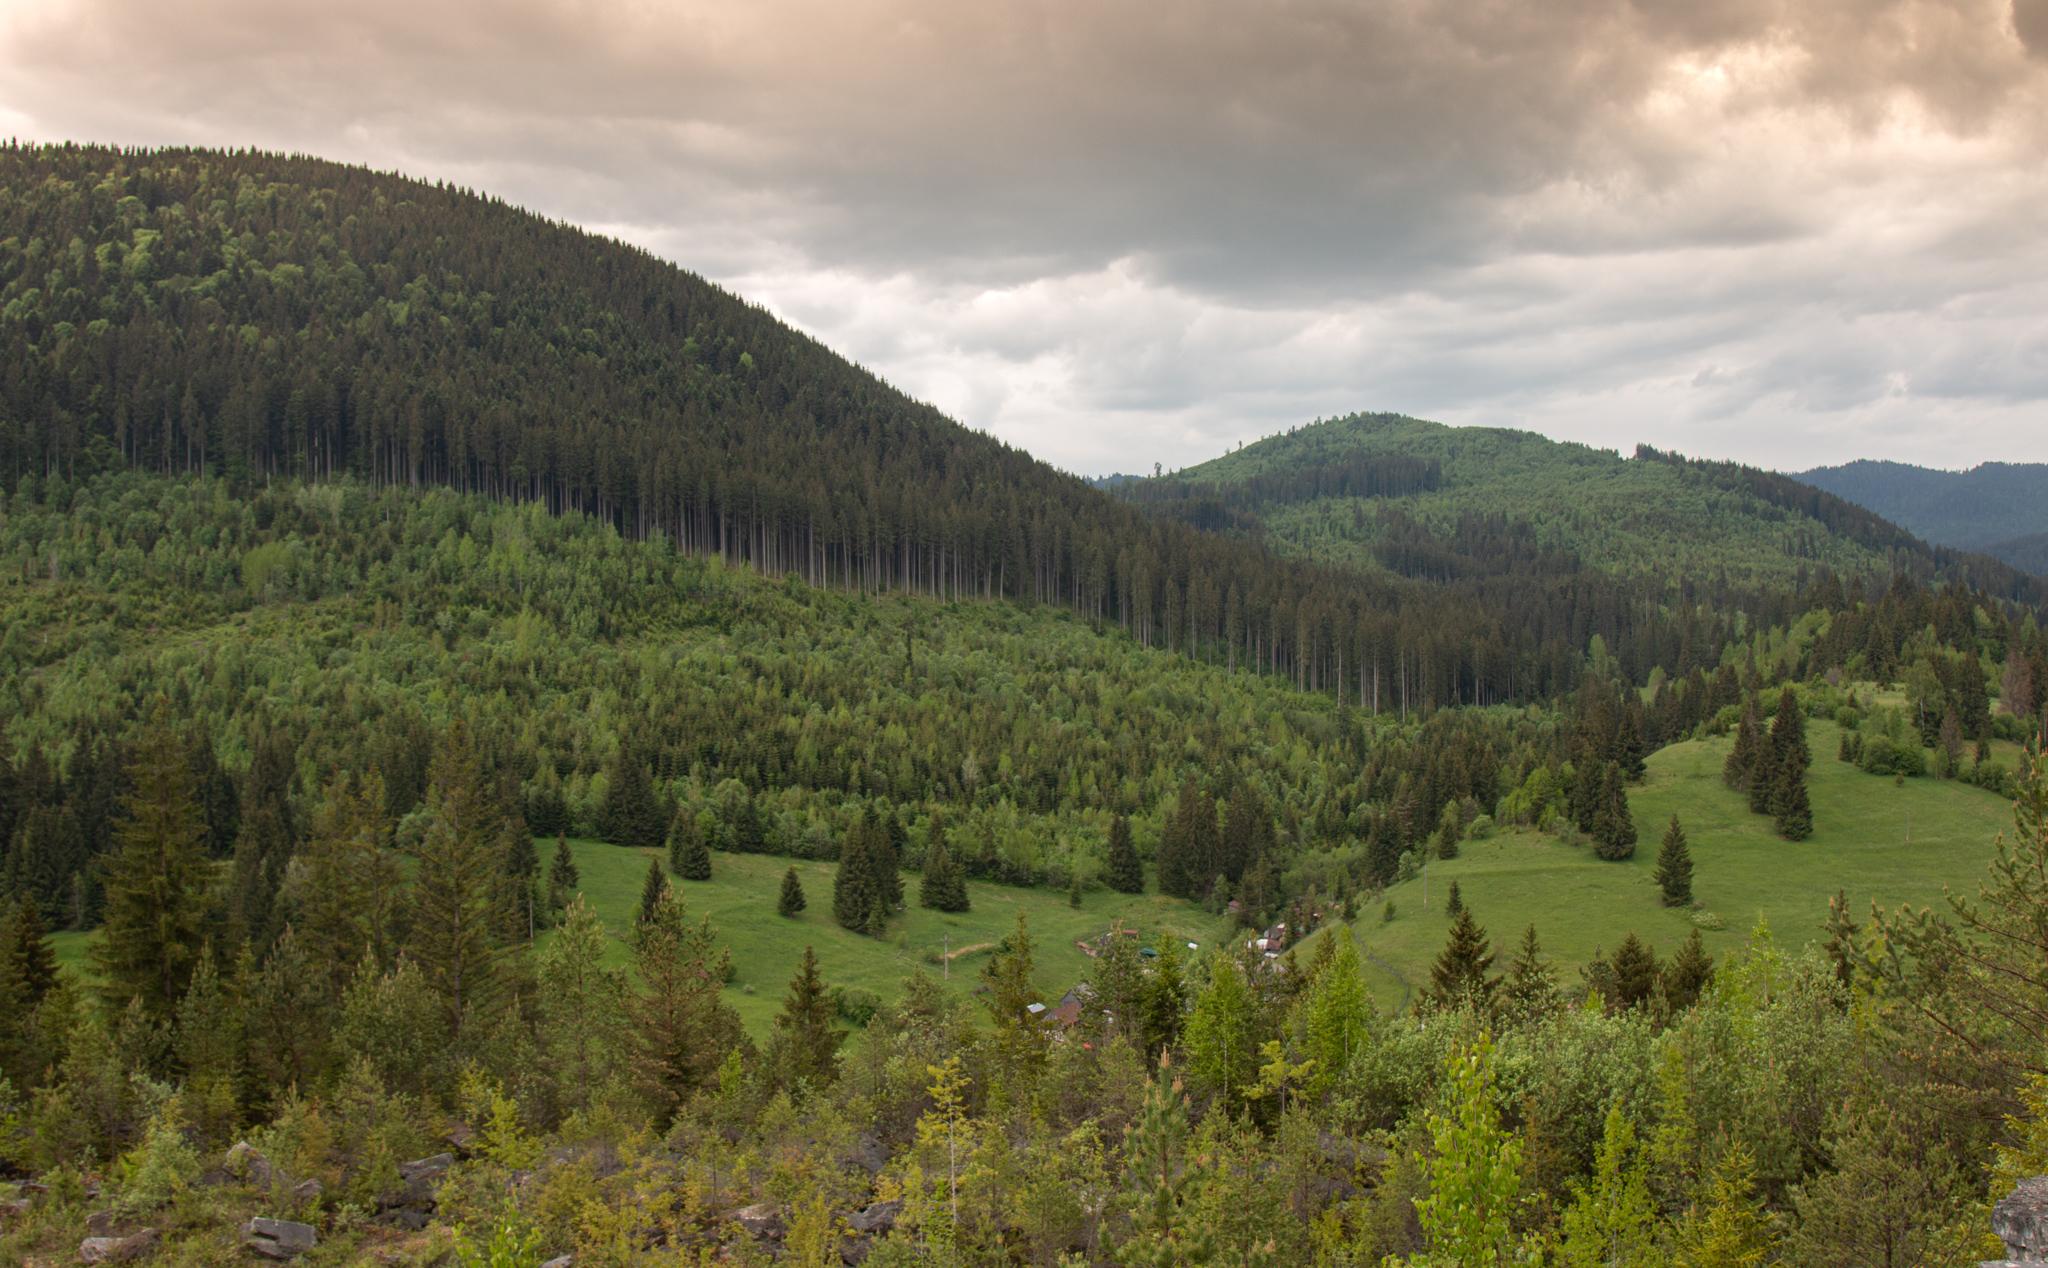 view from fairies glade, Borsec